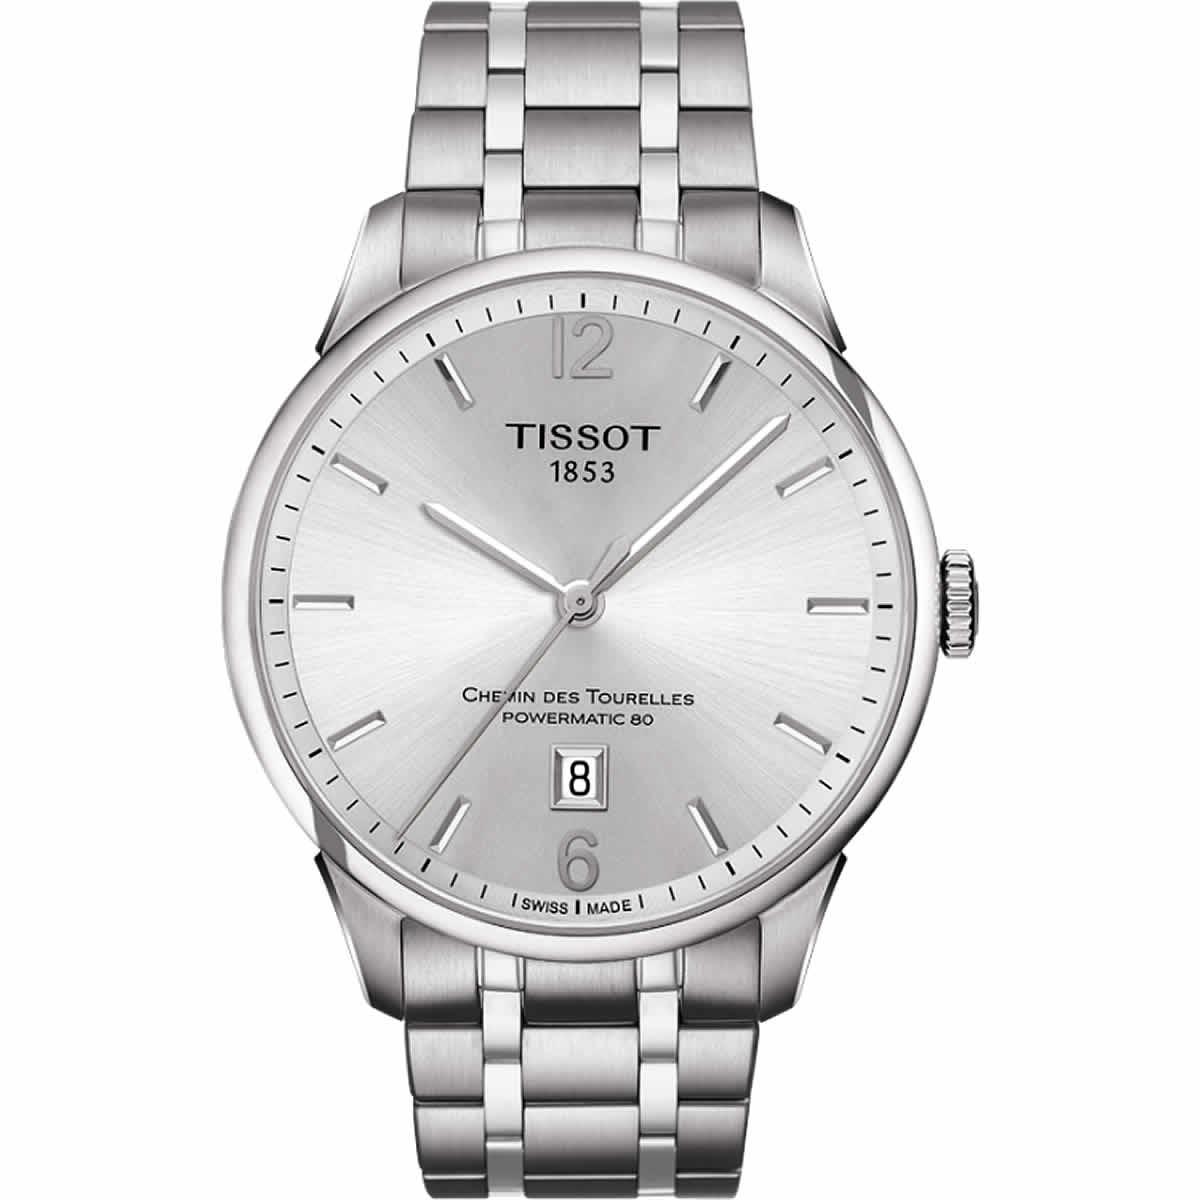 Tissot(ティソ) CHEMIN DES TOURELLES  (シャミン・ド・トゥレル )t0994071103700